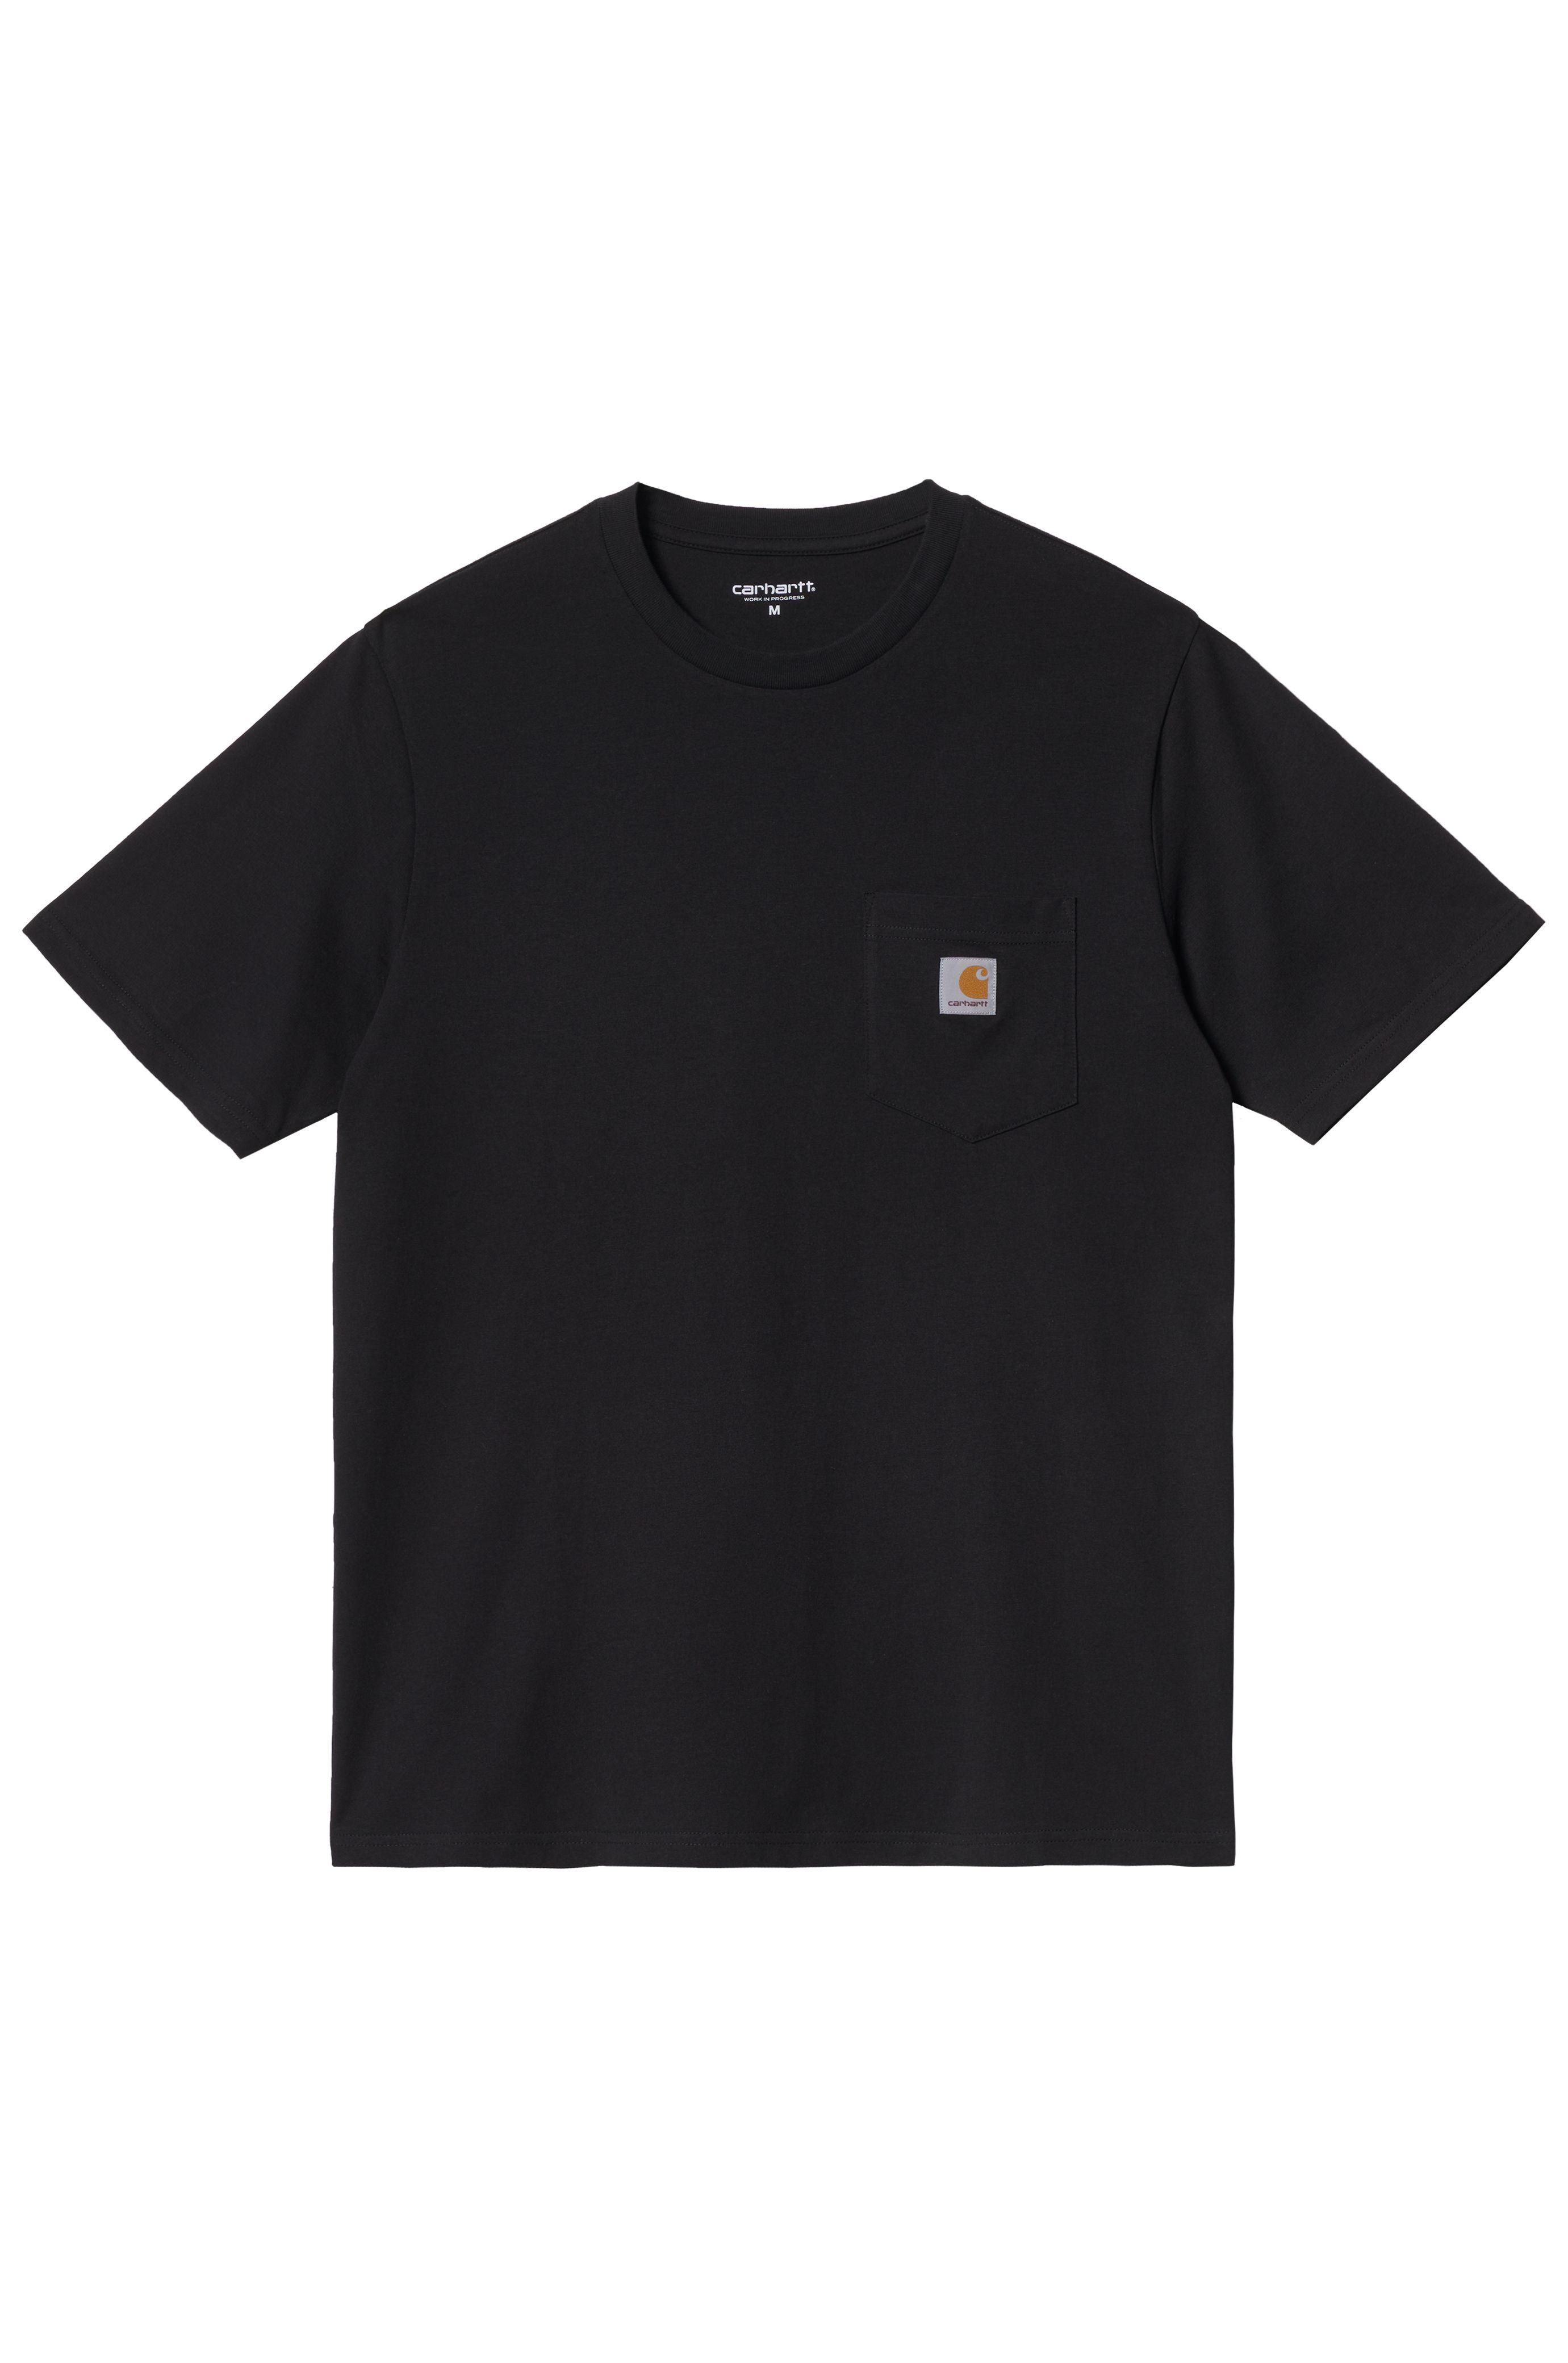 Carhartt WIP T-Shirt POCKET Black